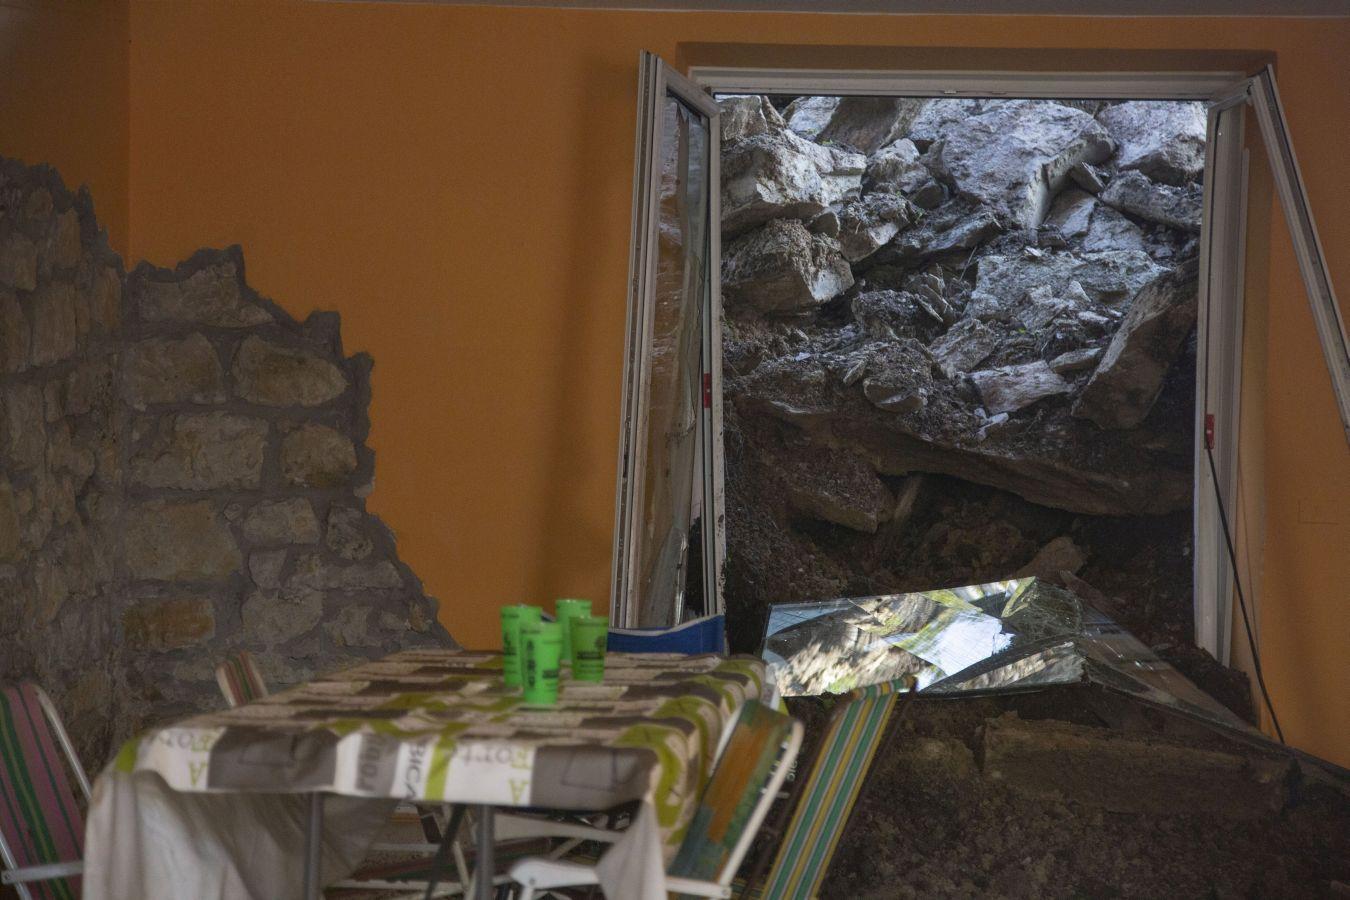 Fotos: Desalojados tras un derrumbe en San Sebastián - Diario Vasco